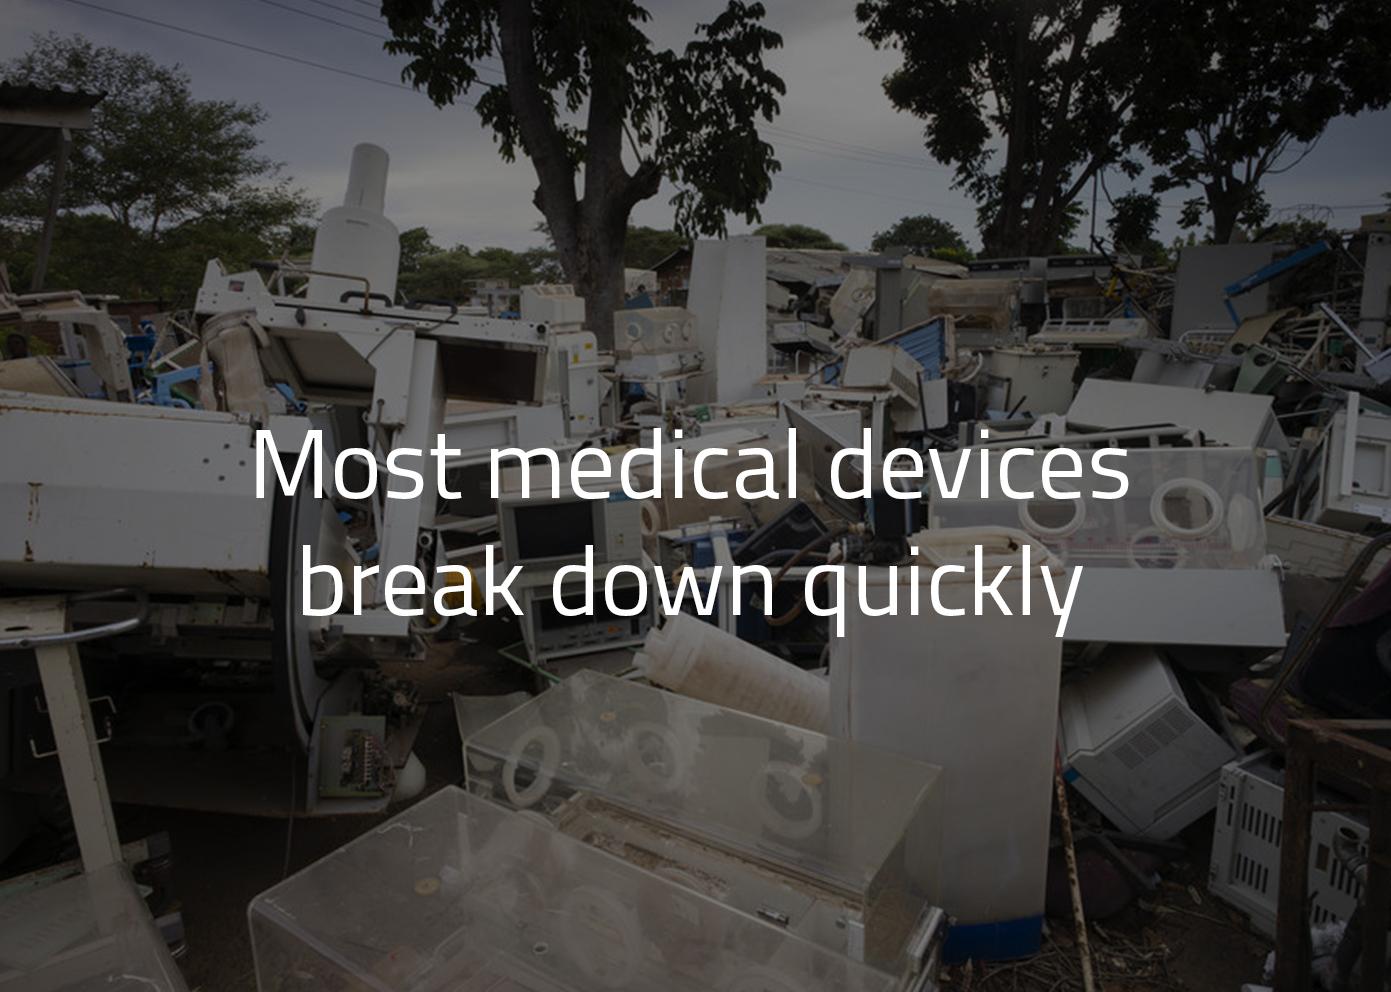 NPR article about broken equiptment